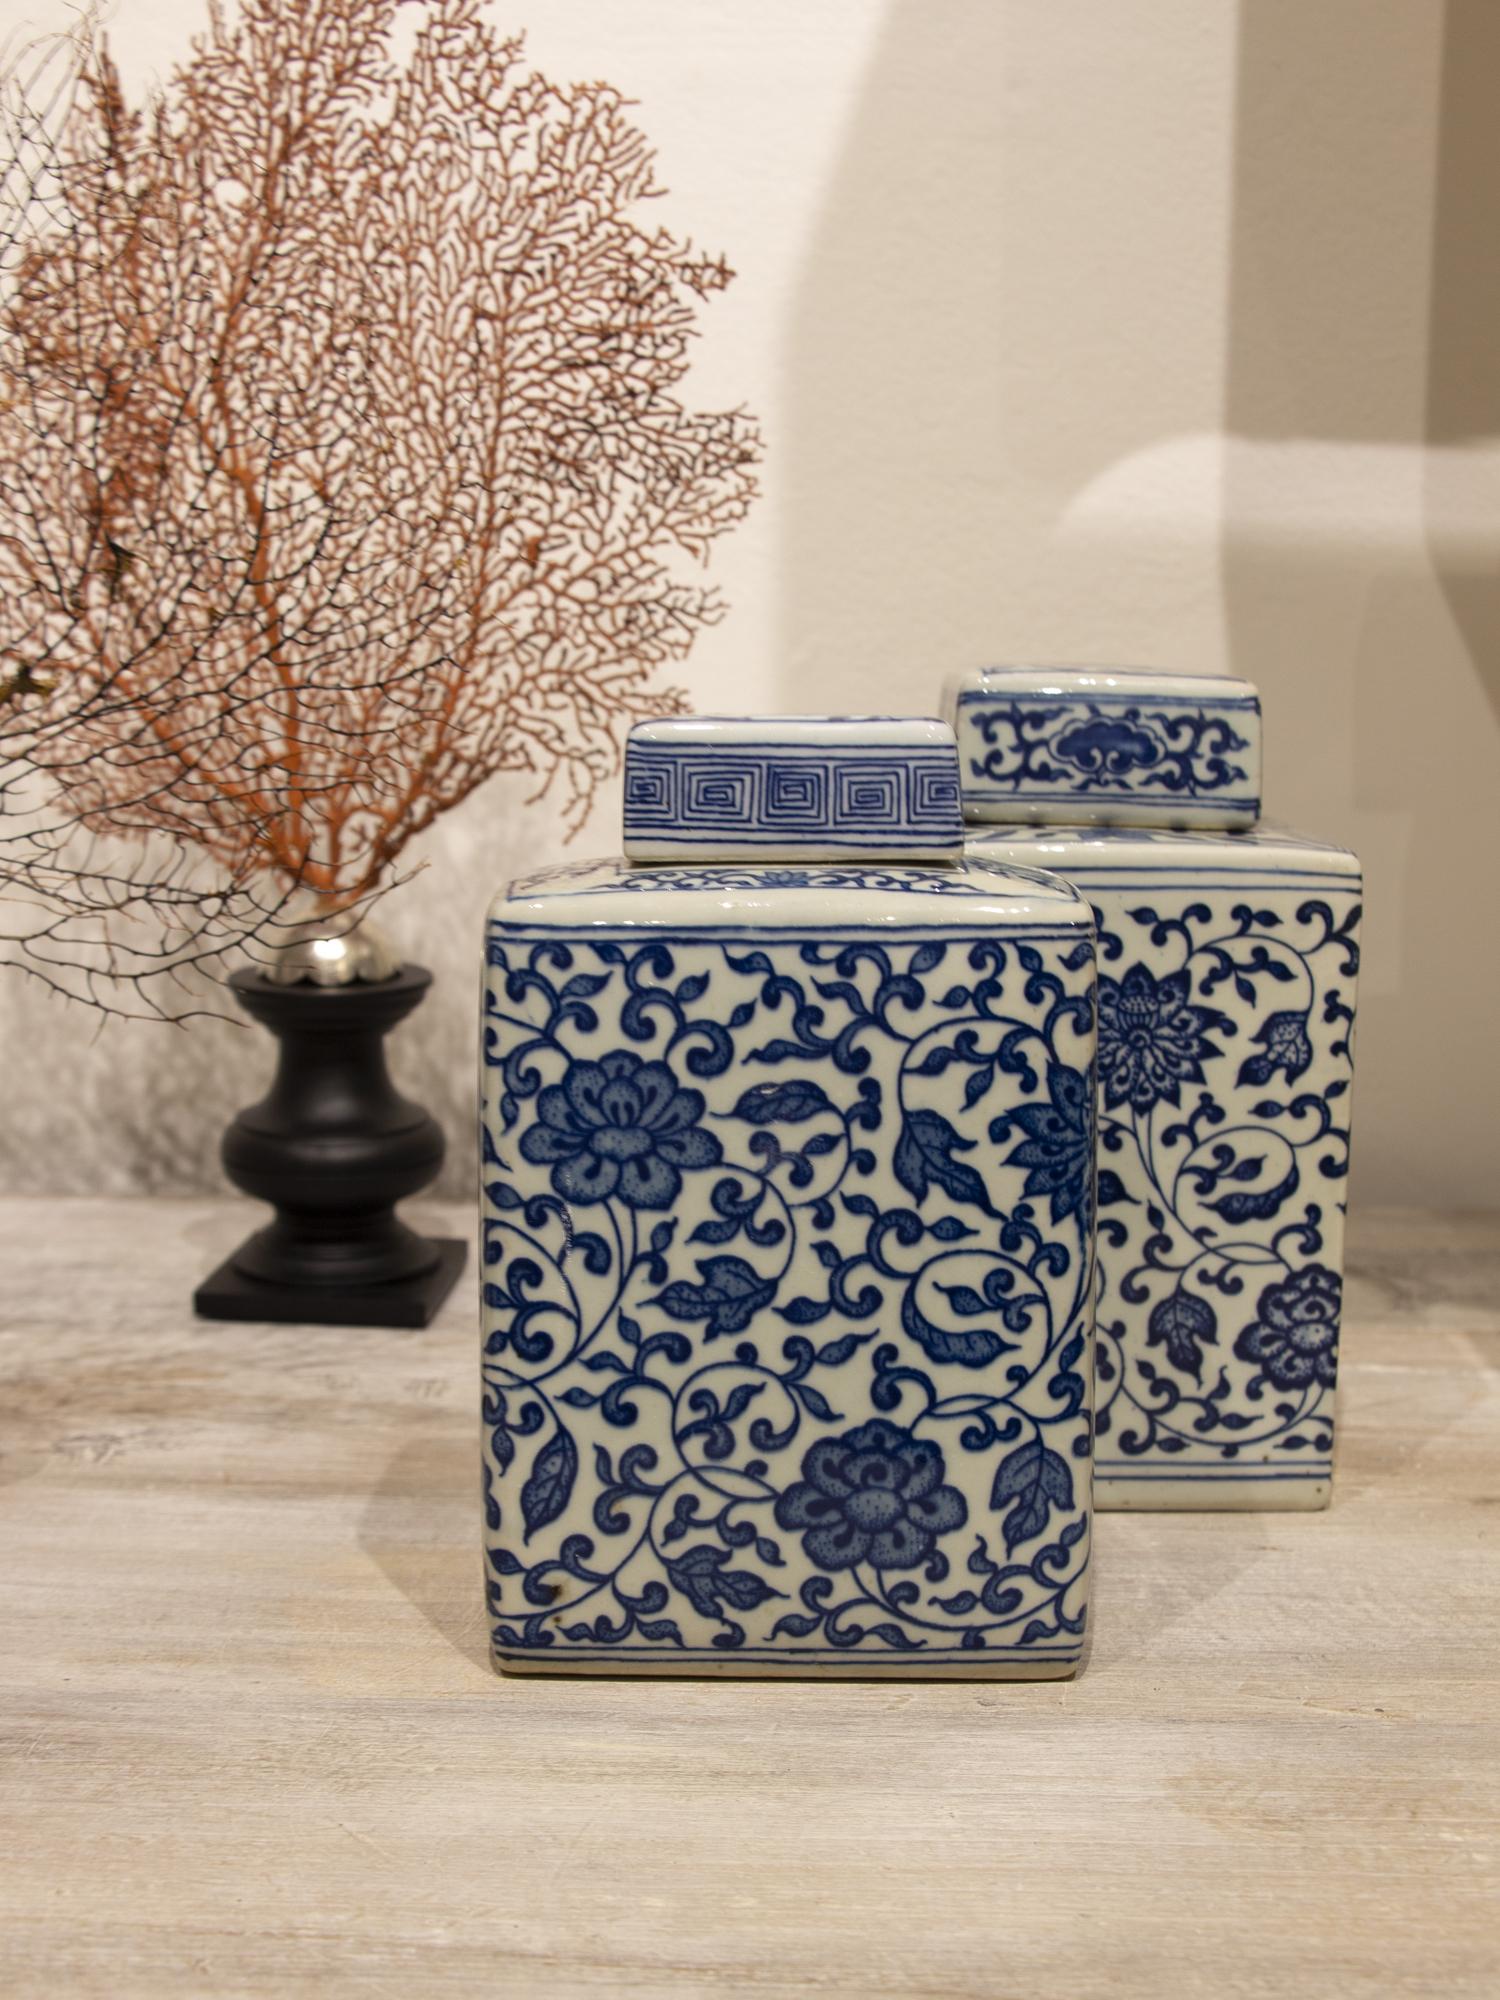 Pequeño tibor de porcelana chinesa con tapa. Con estampados florales azules.